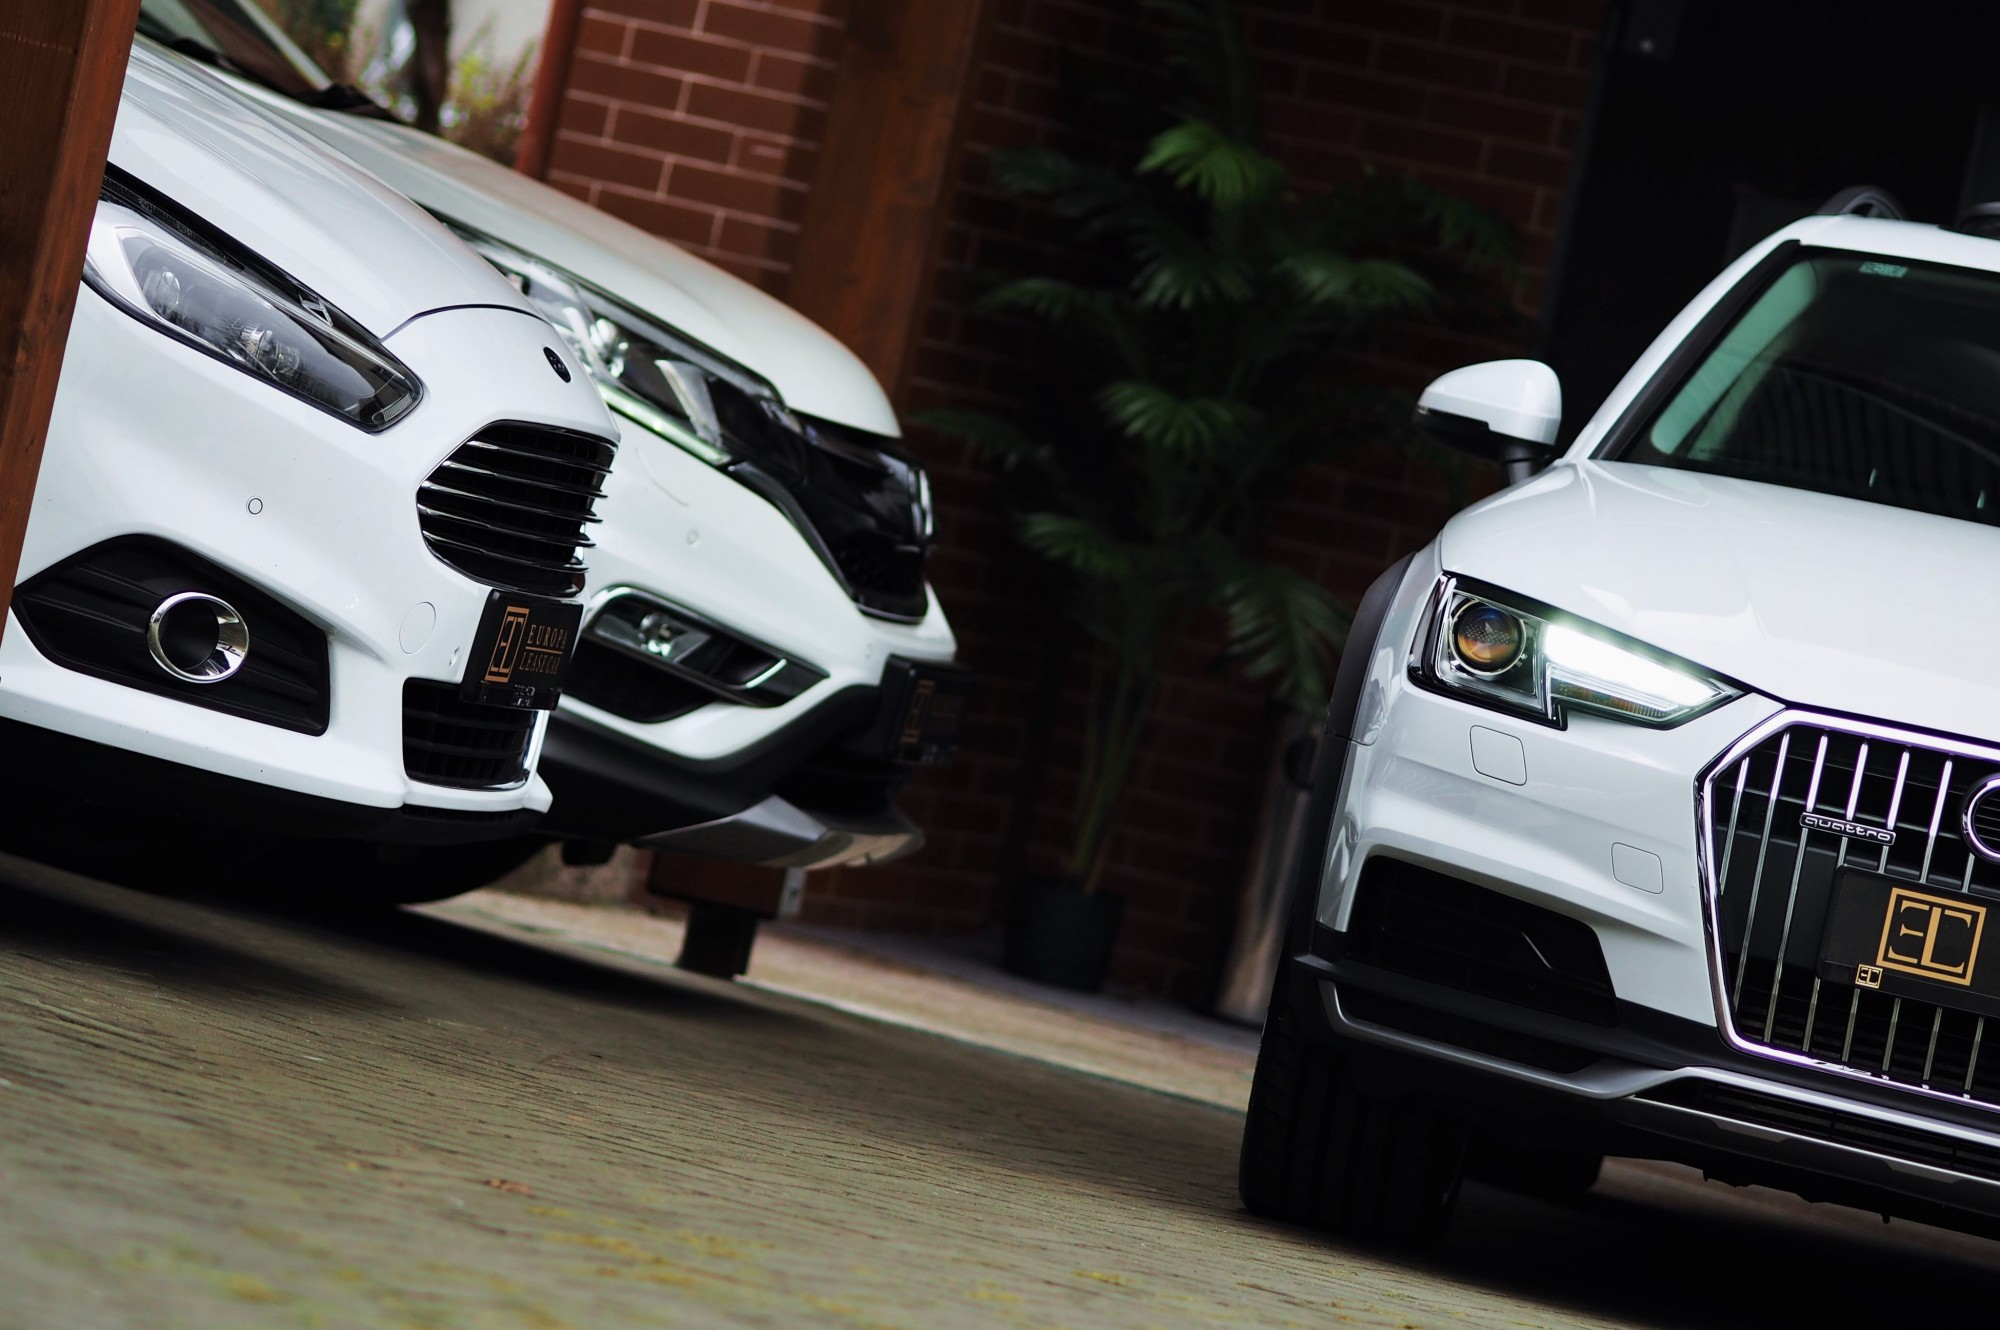 na dvore biele auta